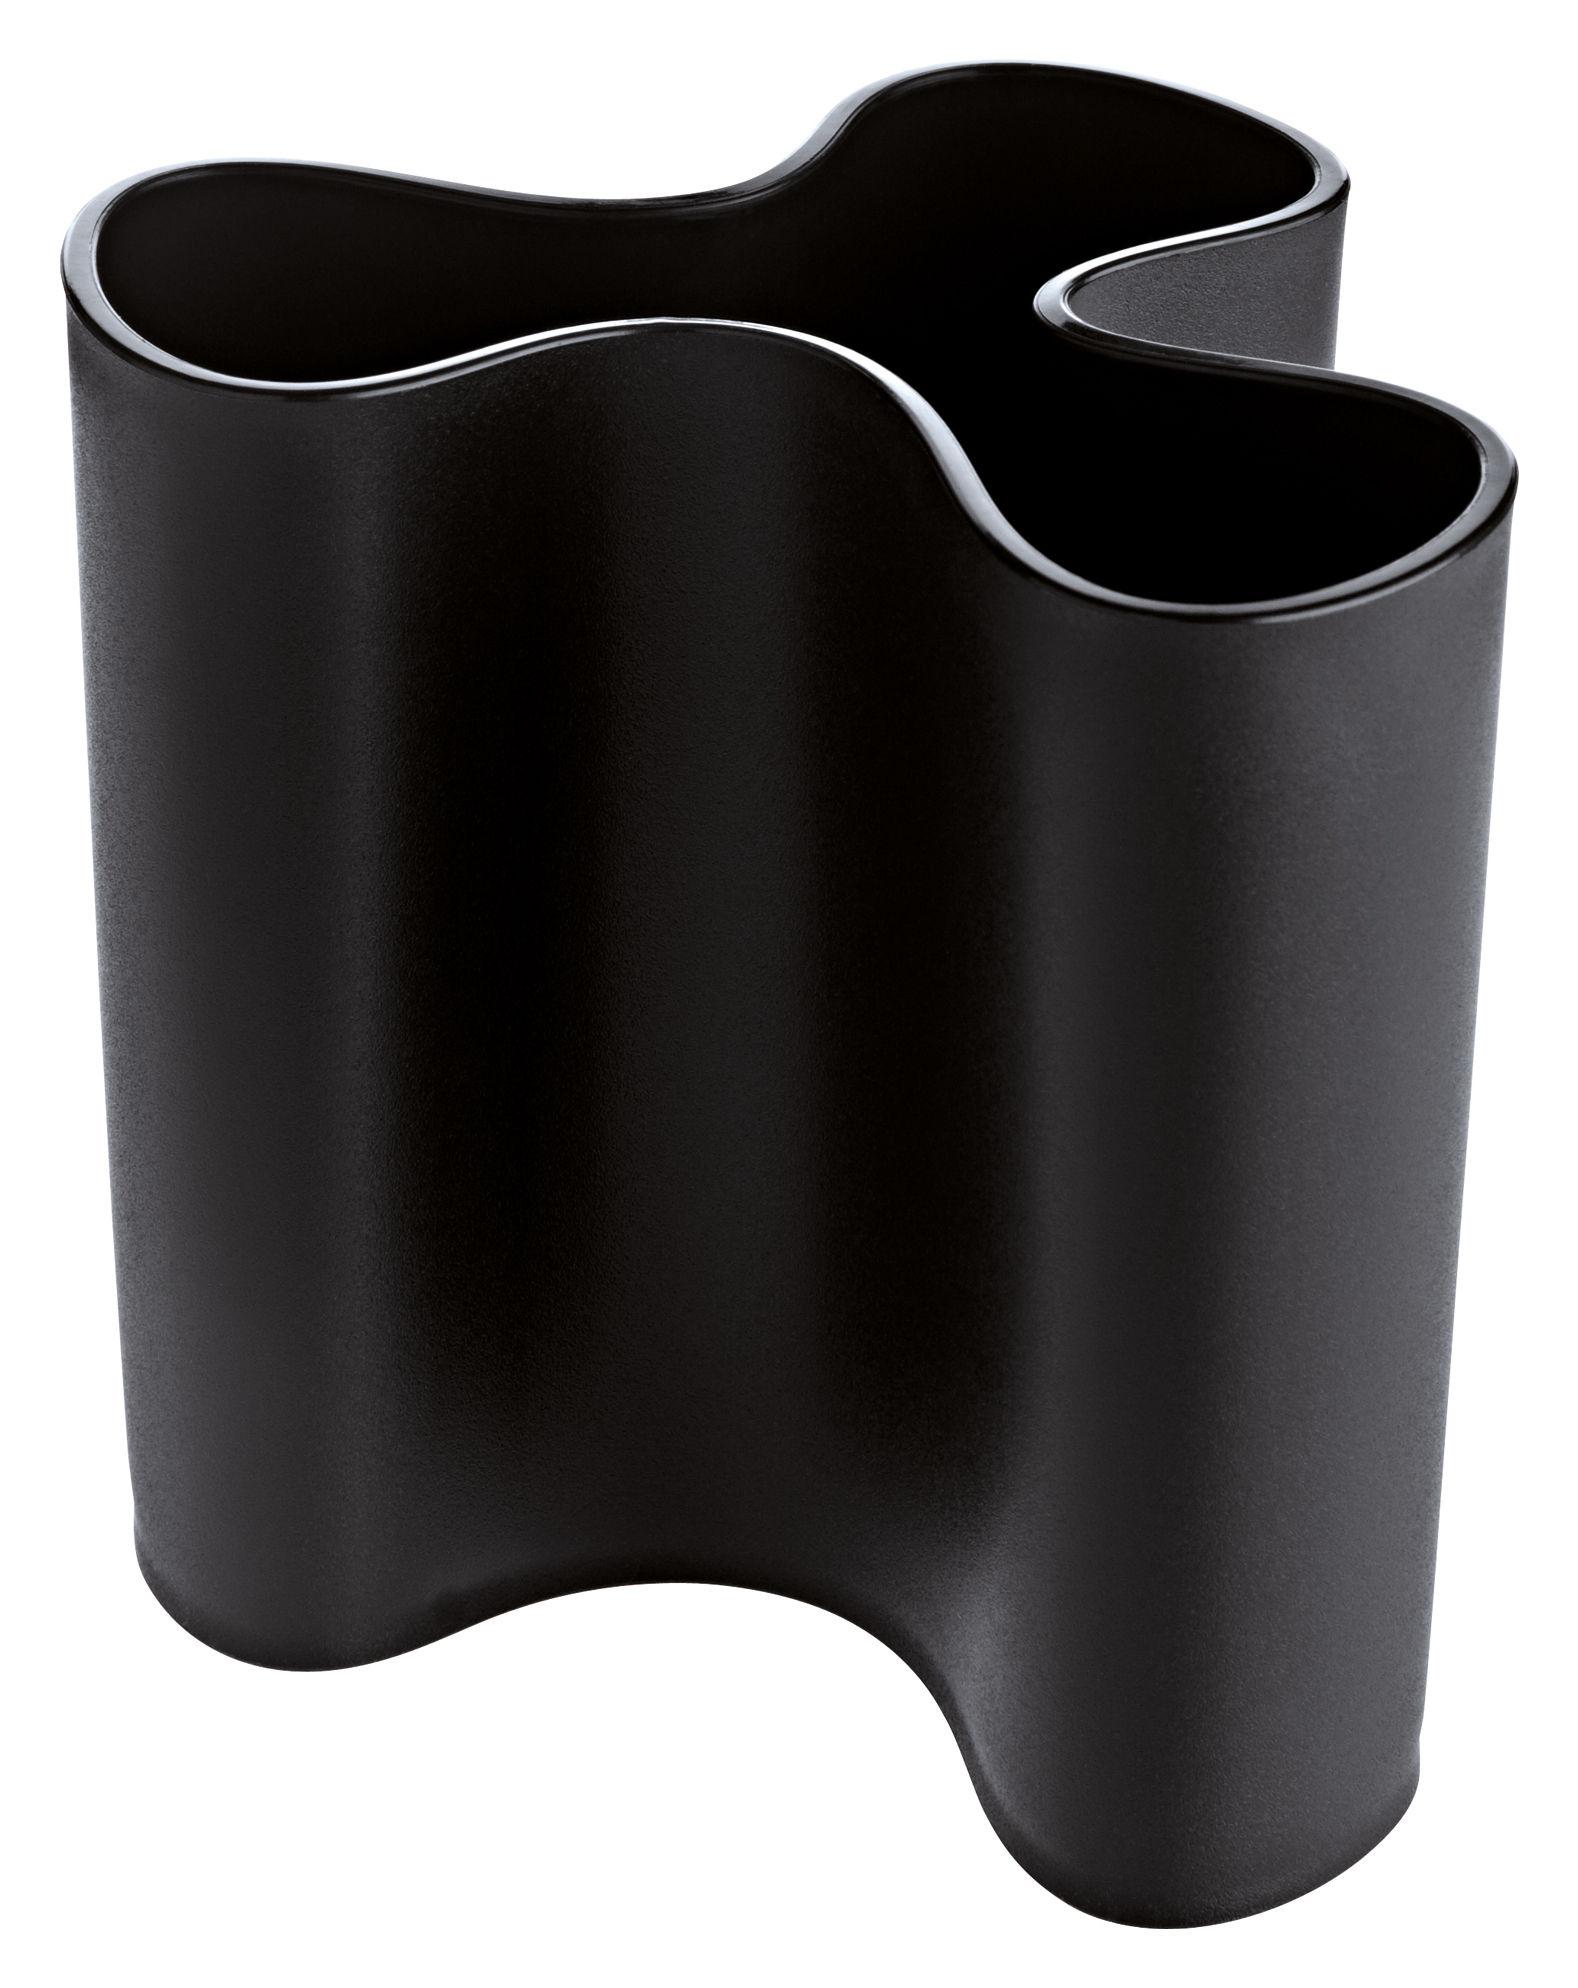 Dekoration - Vasen - Clara Vase - Koziol - Schwarz - Plastikmaterial